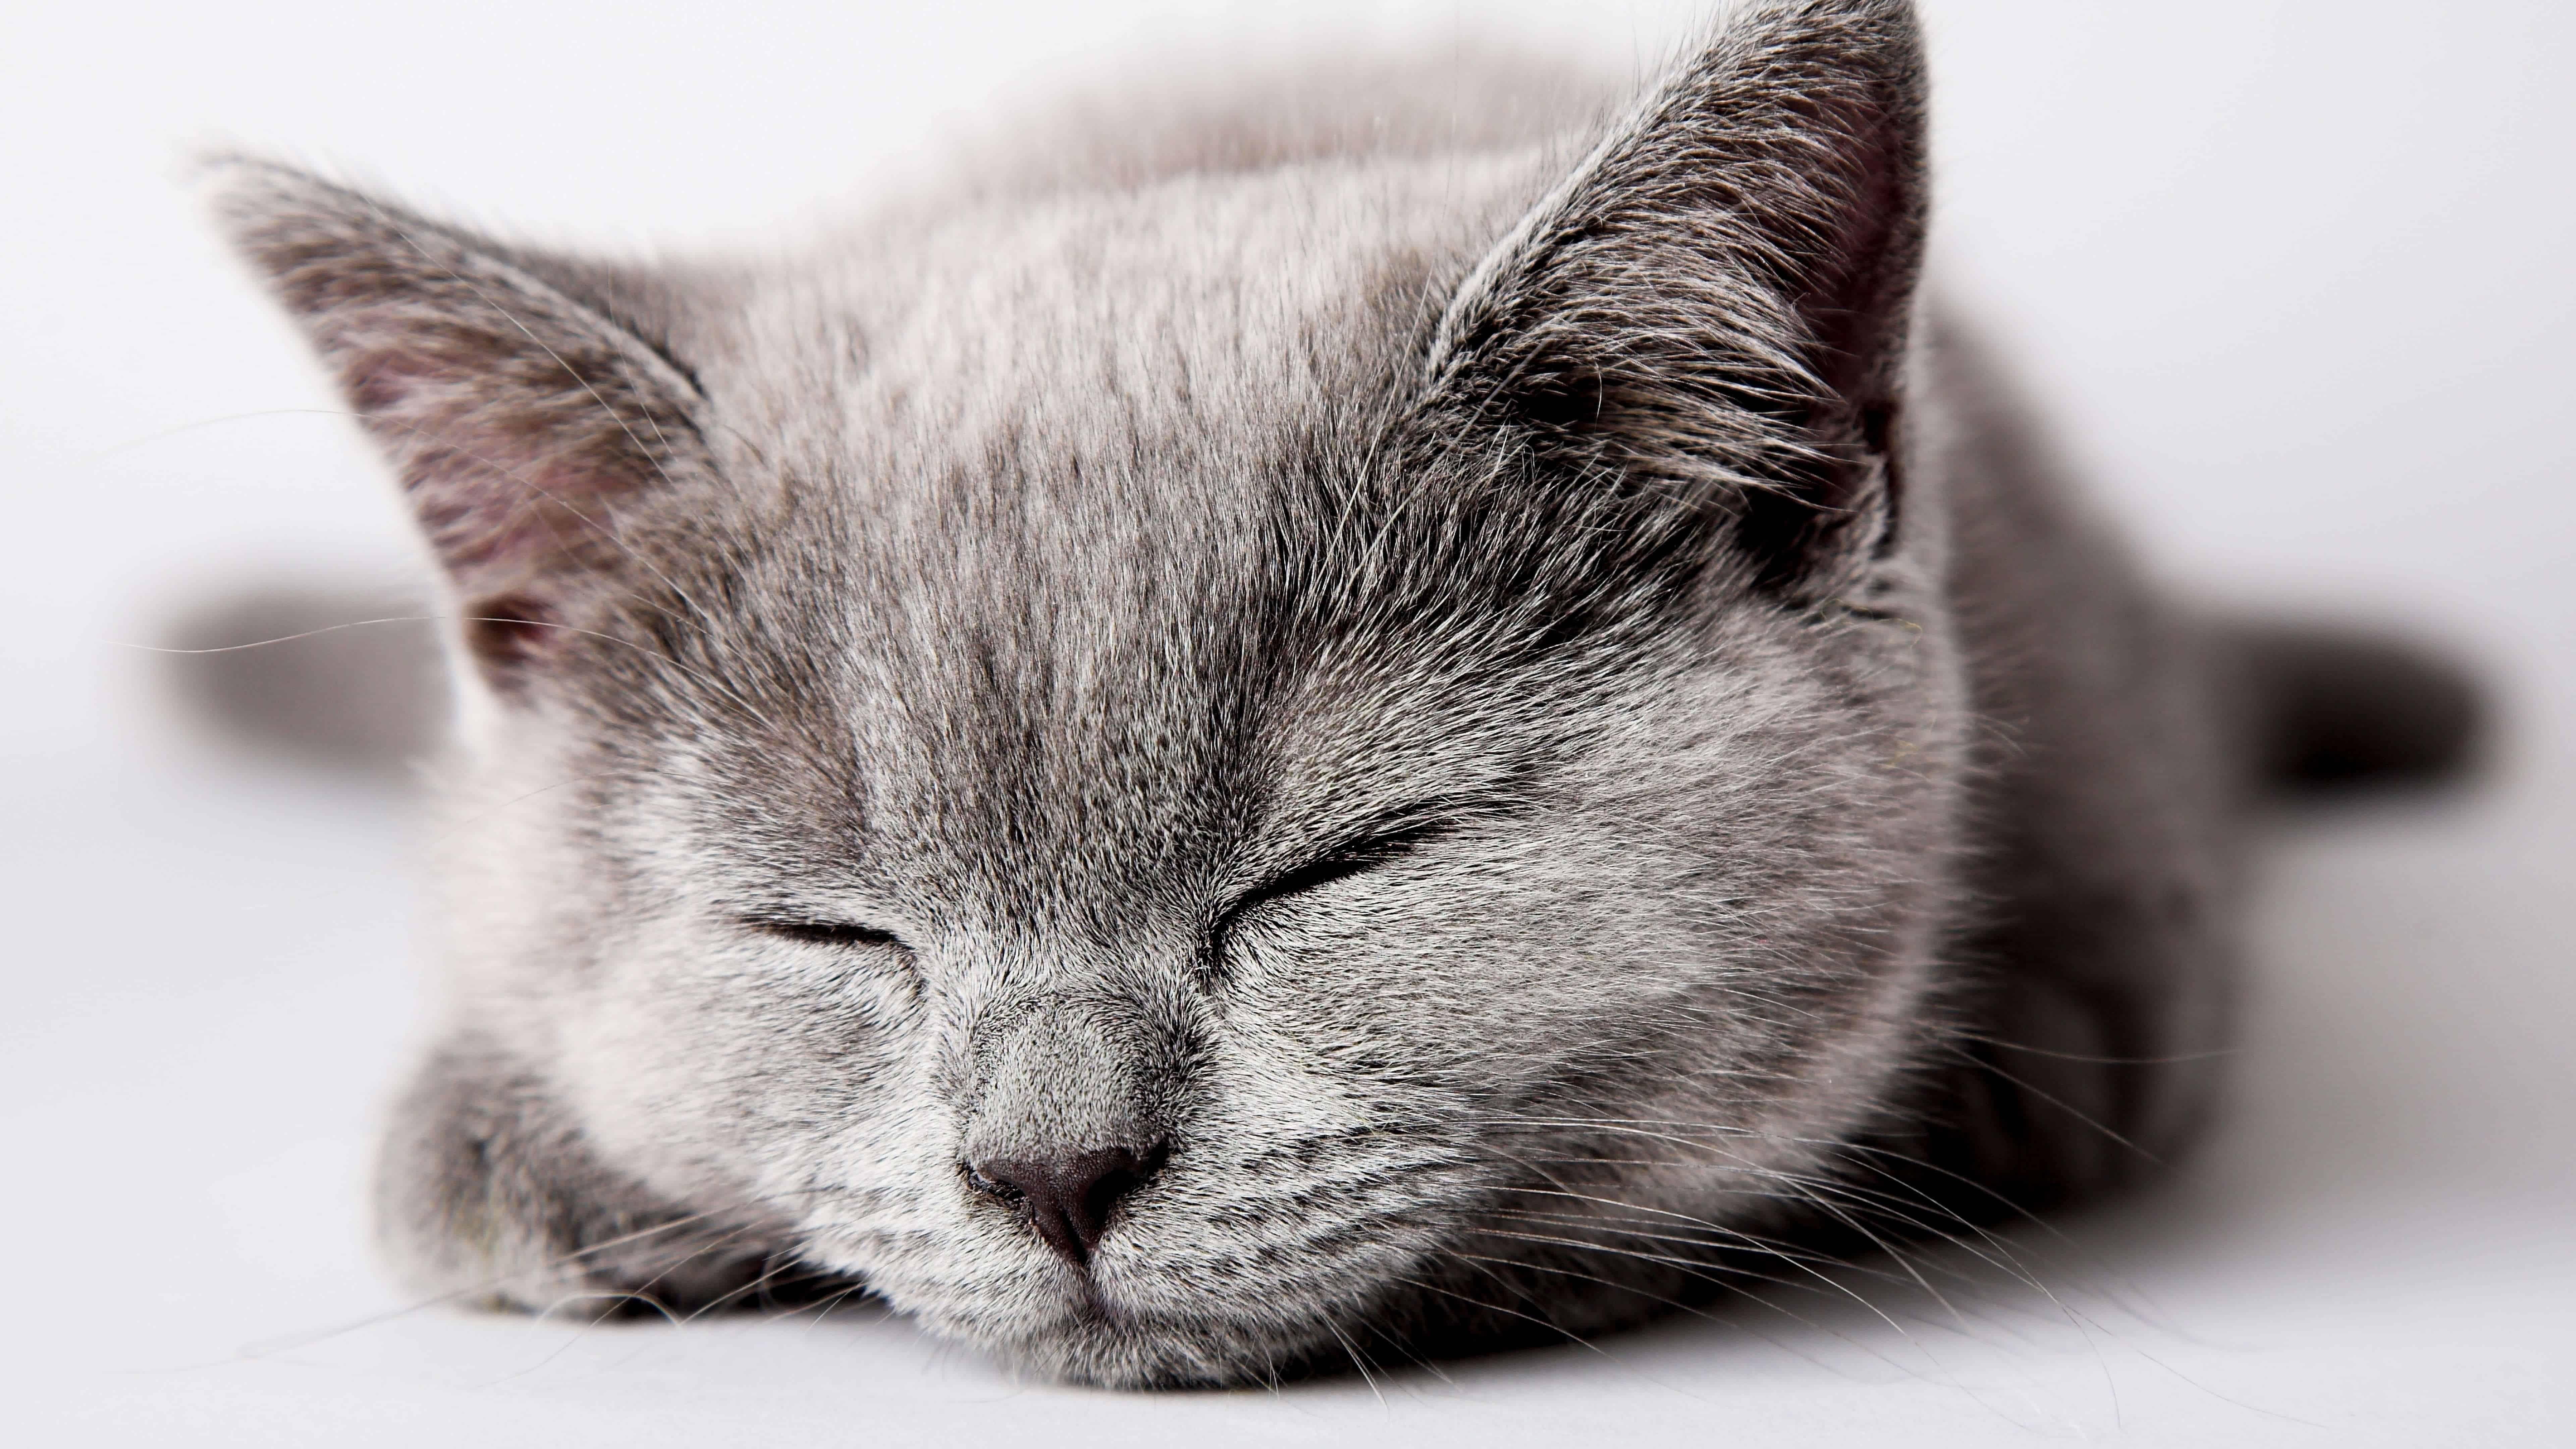 sleeping grey kitten uhd 8k wallpaper